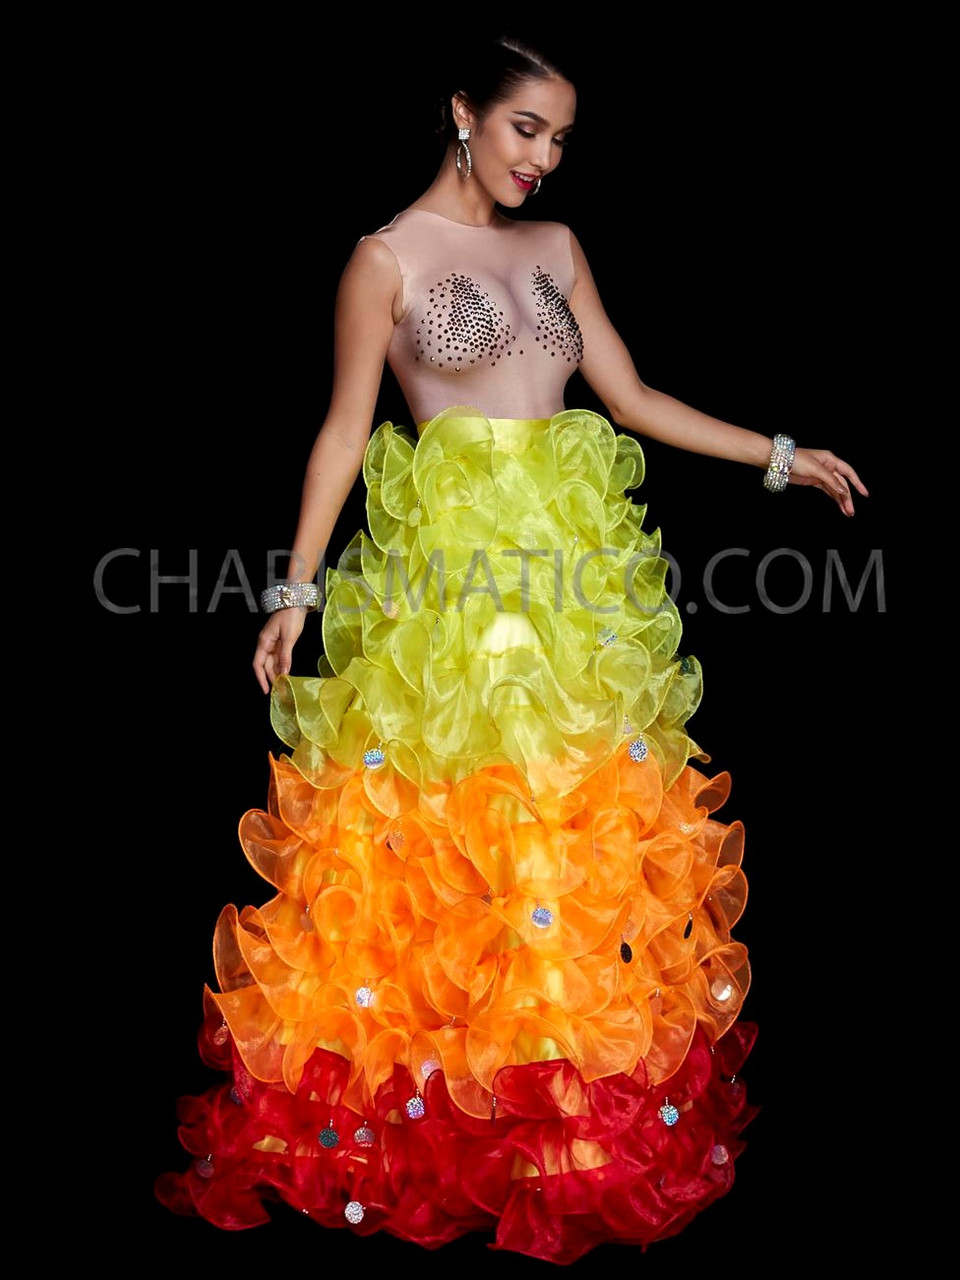 CHARISMATICO GOLD JUMBO RUFFLE drag Queen SPECTACULAR DIVA SISSY Organza BOA